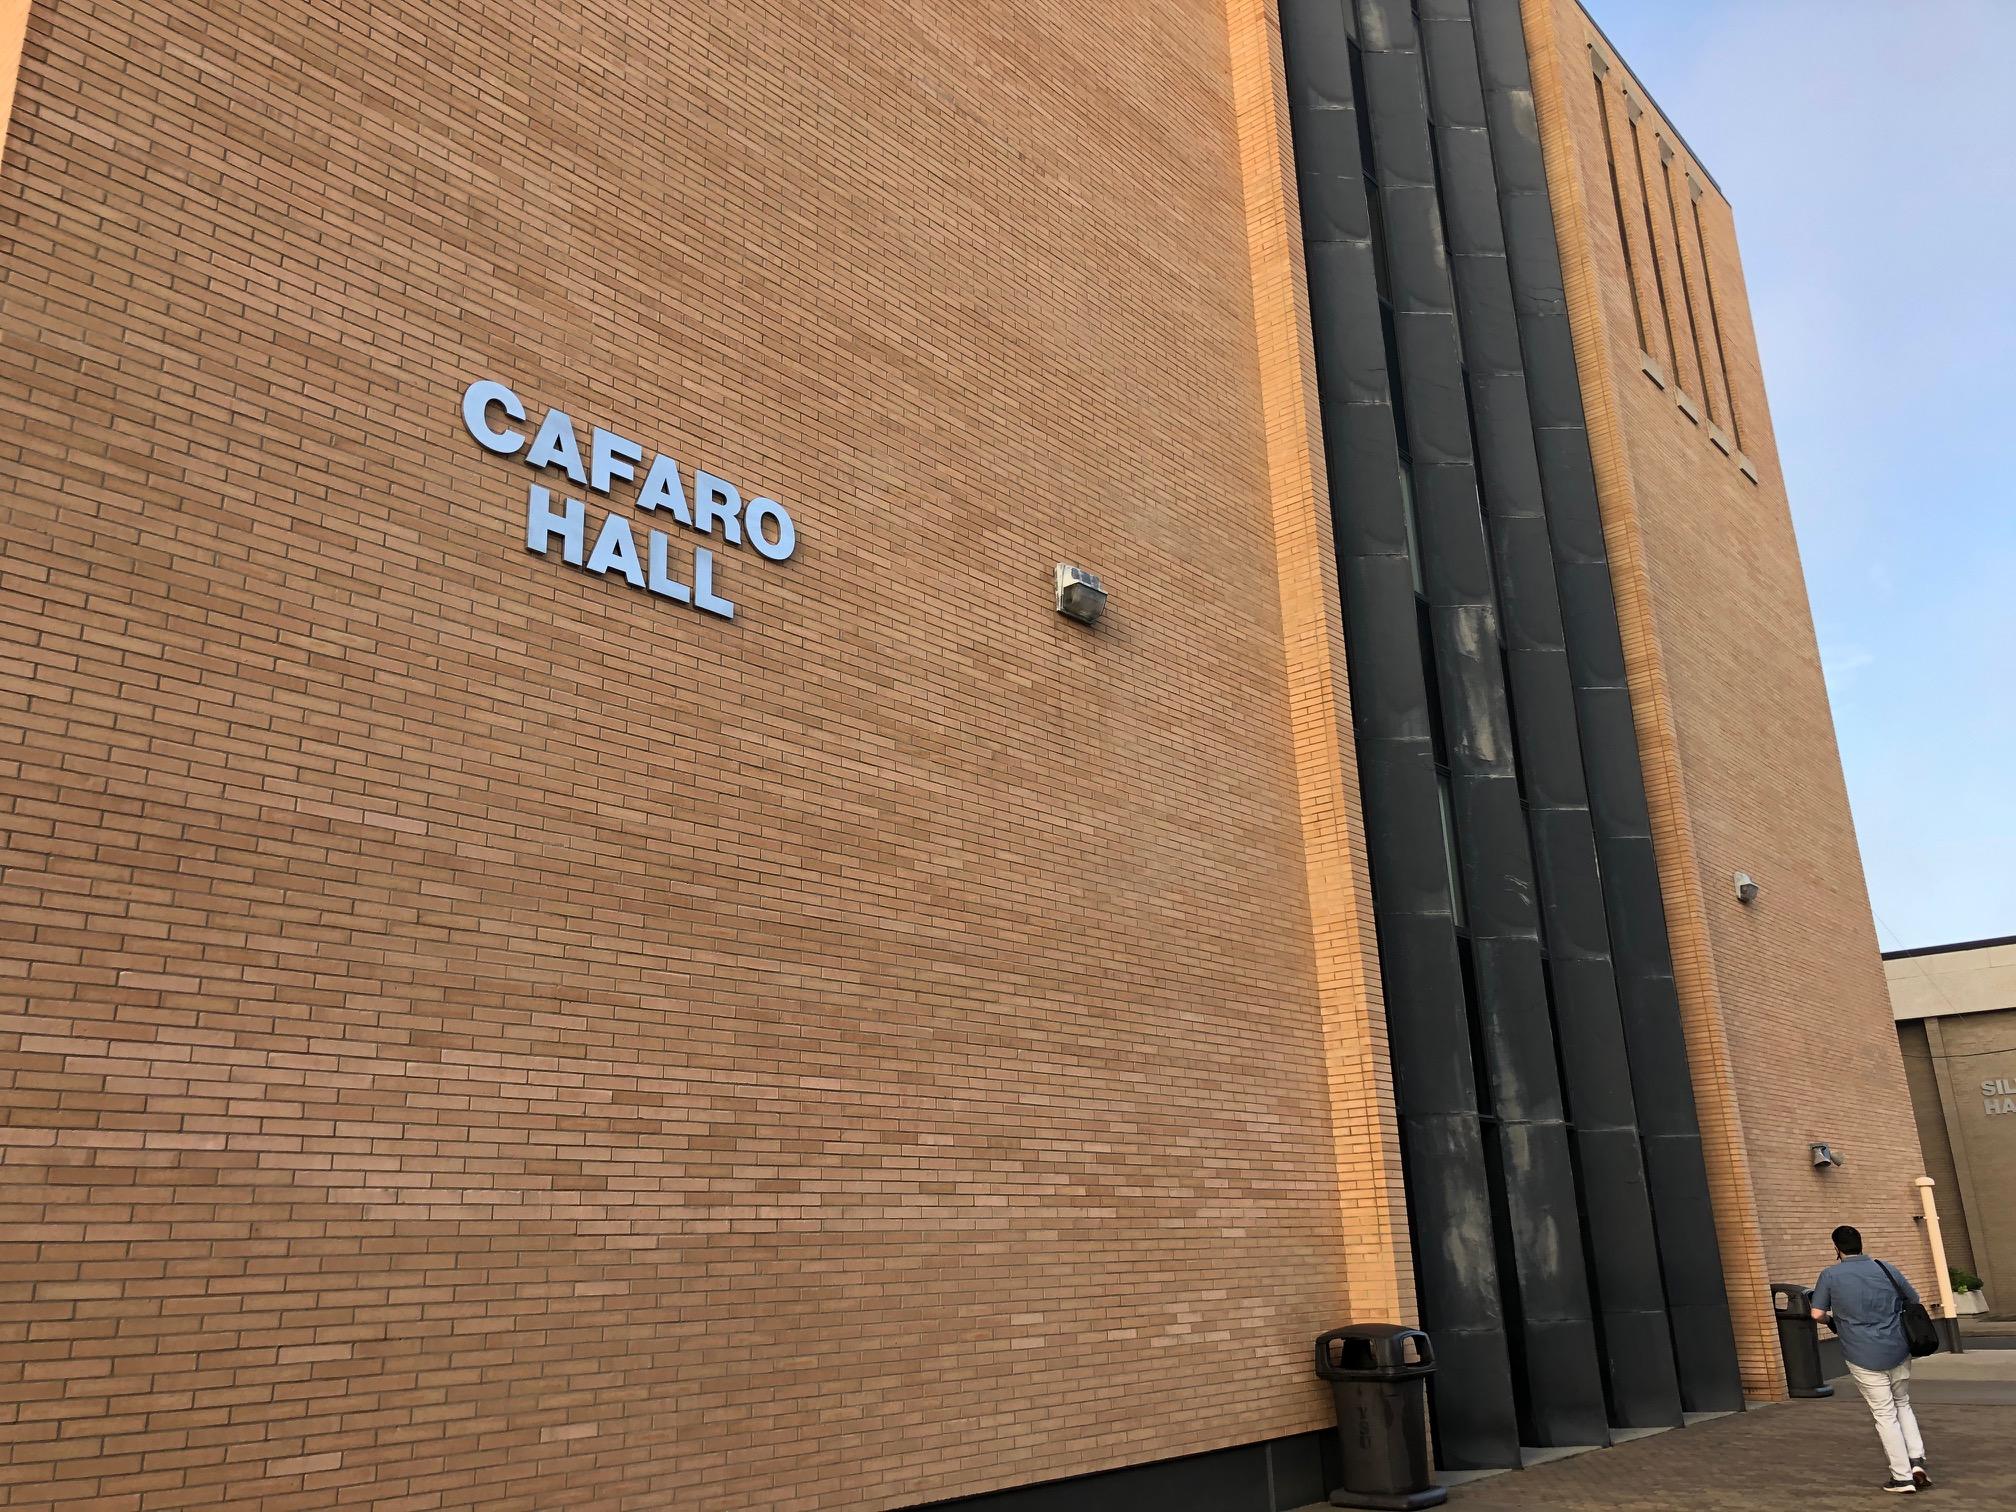 Cafaro Hall